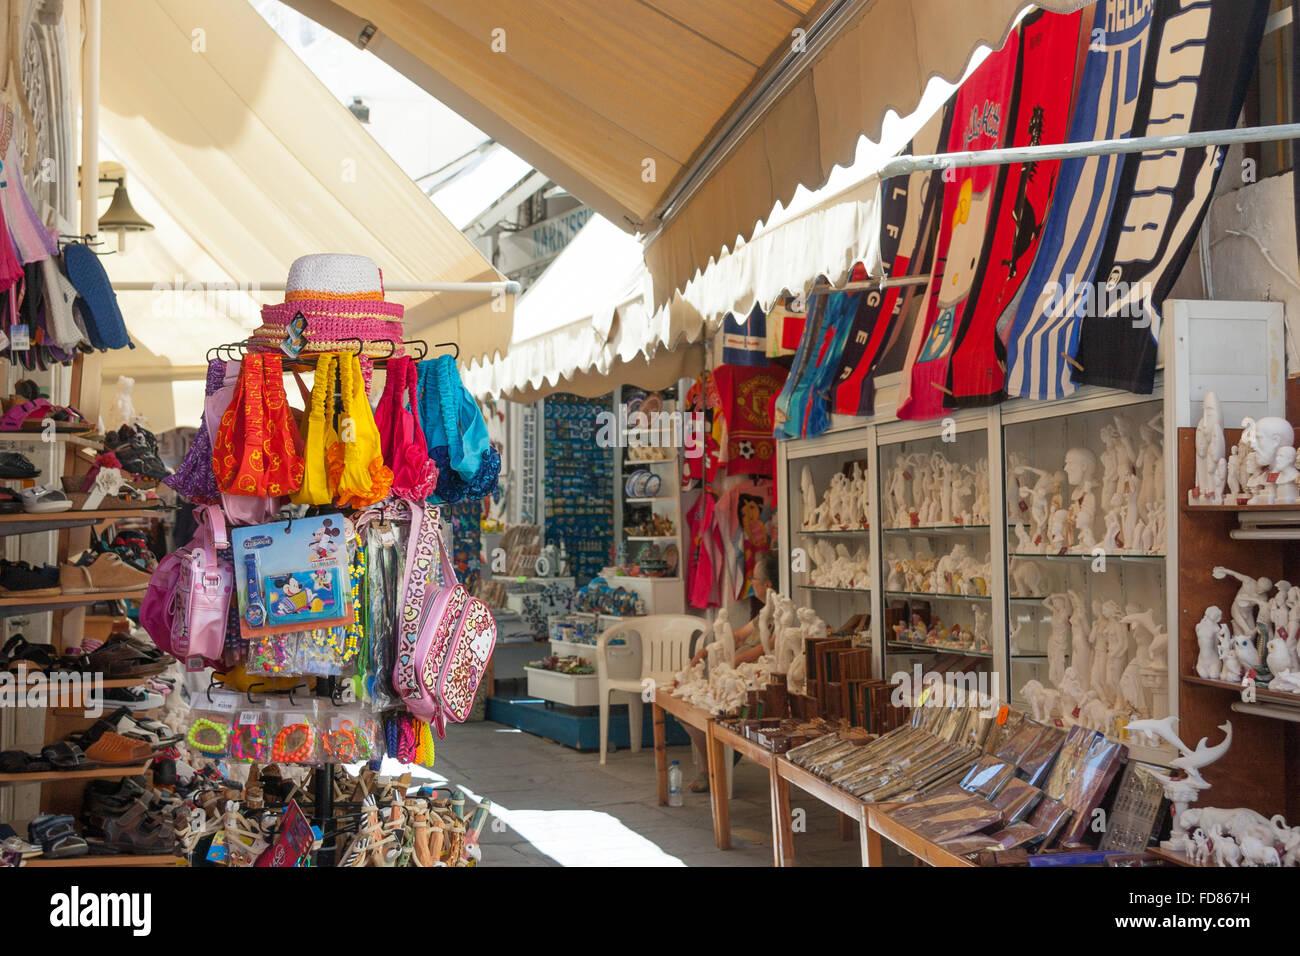 Tourist souvenir street market shop in Kos Town, Greece Stock Photo